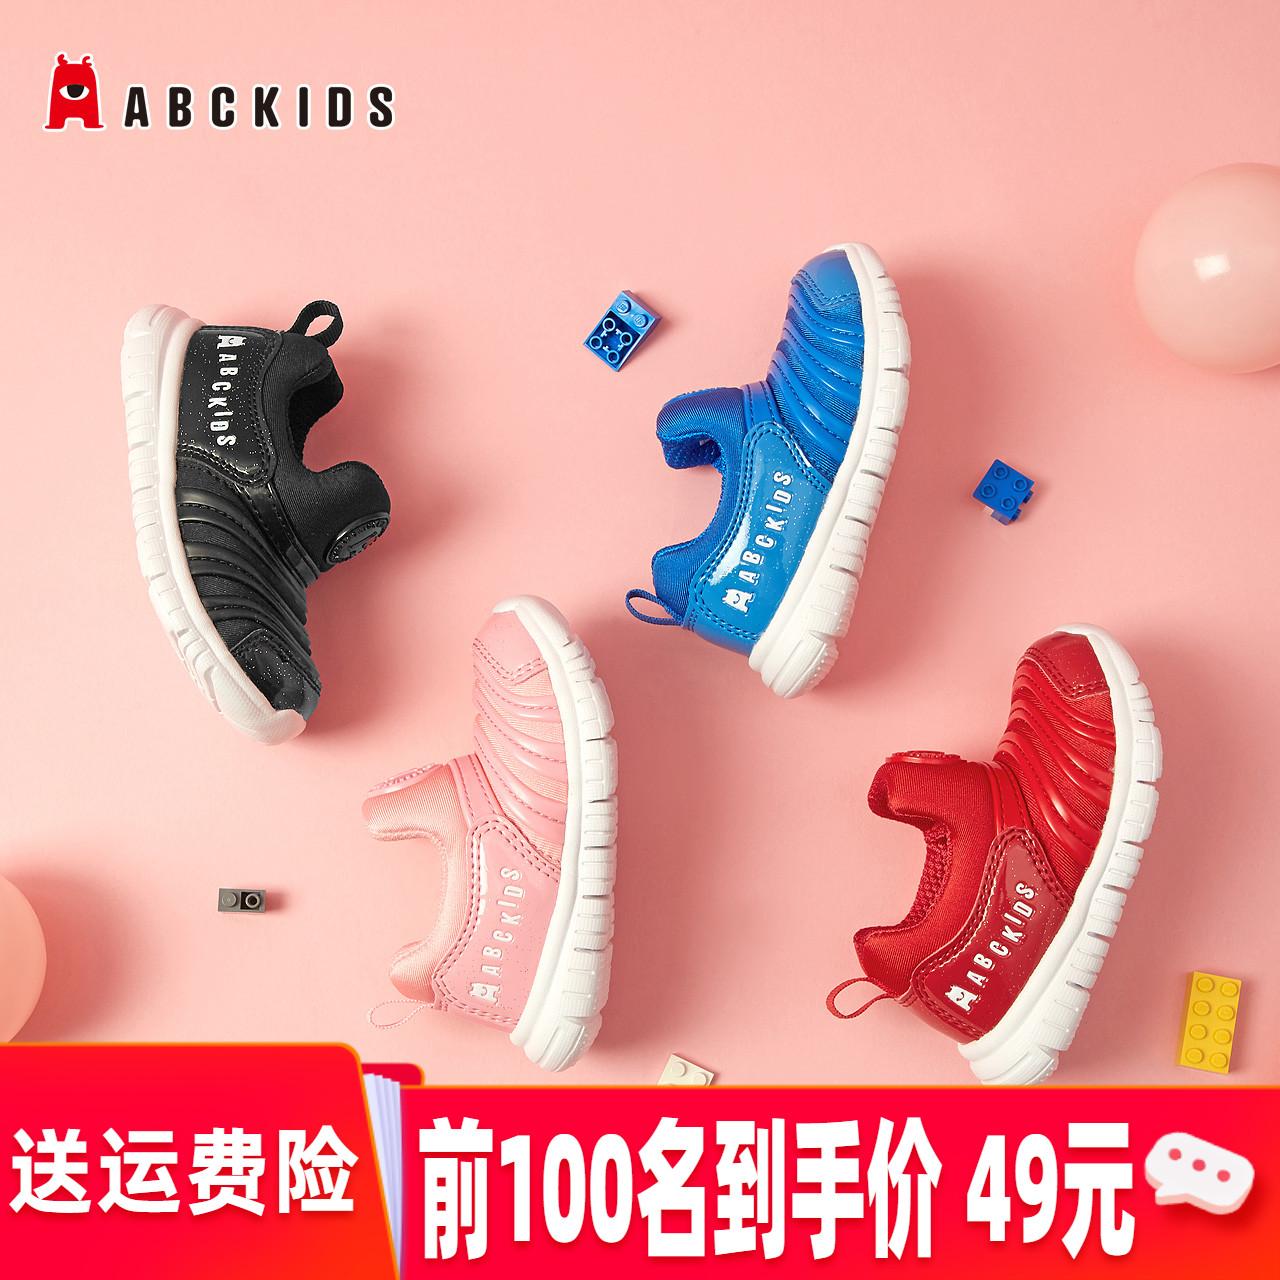 abckids童鞋男童毛毛虫鞋2020春夏女童宝宝透气网面鞋儿童运动鞋